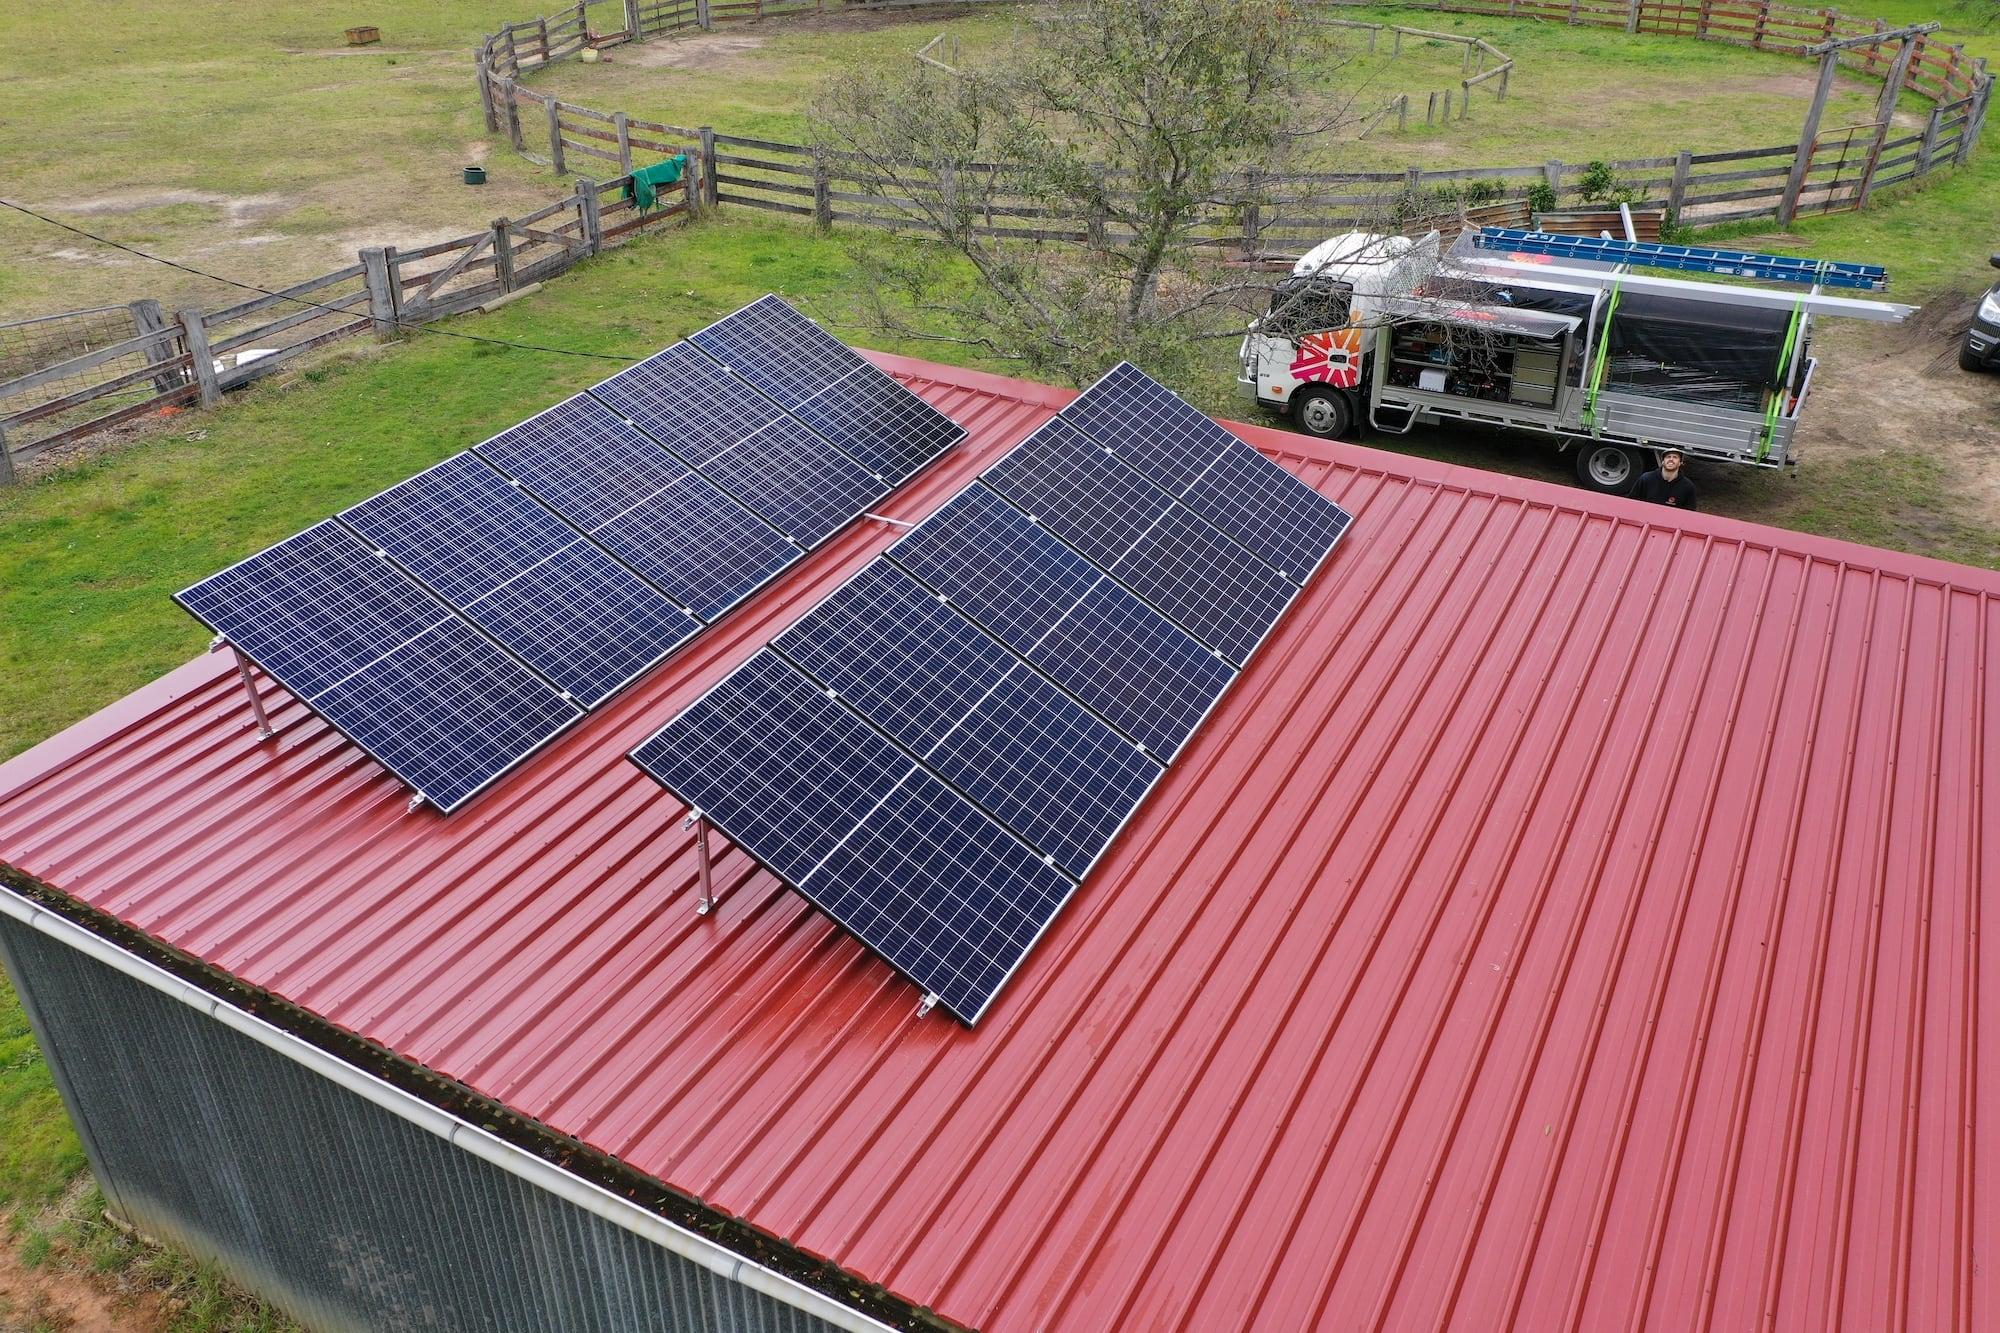 aztech solar panel installation_august 13